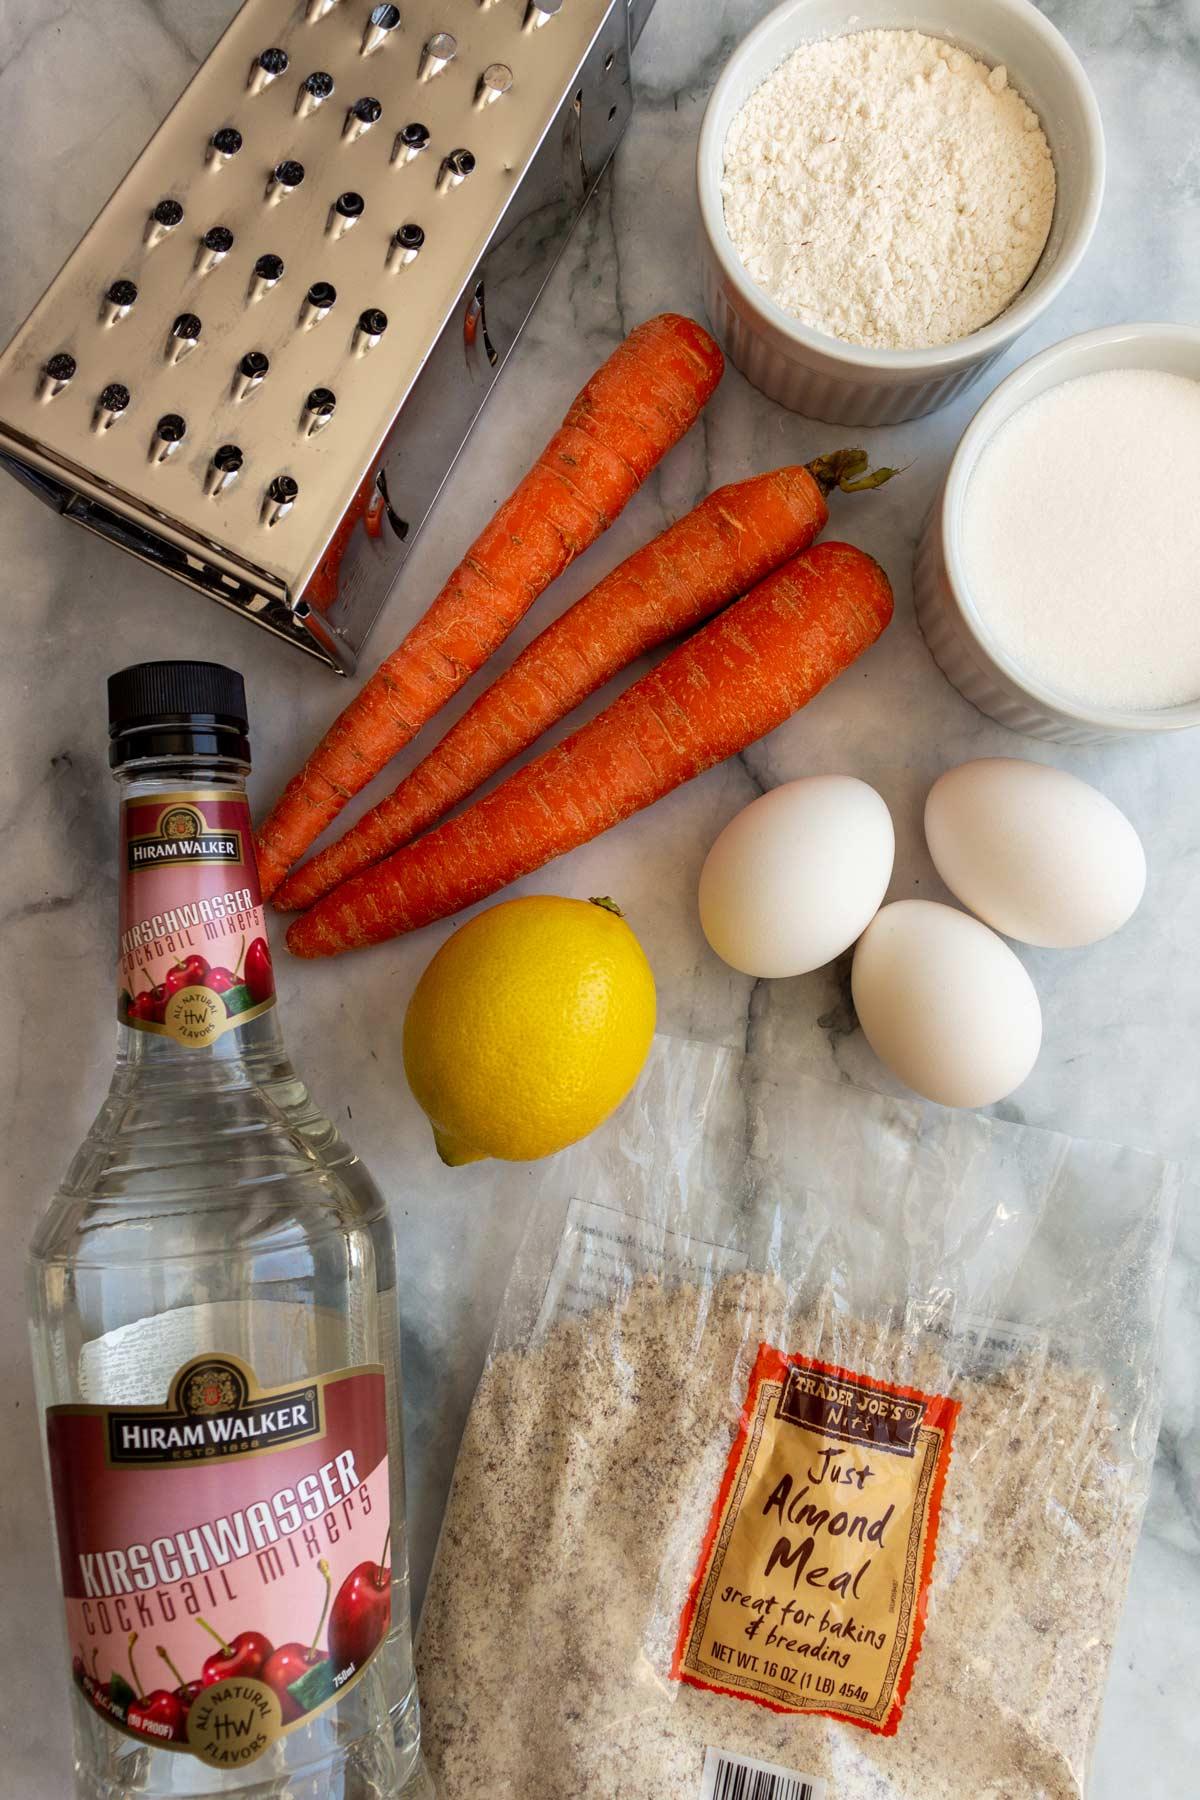 A box grater, carrots, eggs, lemon, almond meal, Kirsch, flour, and sugar.